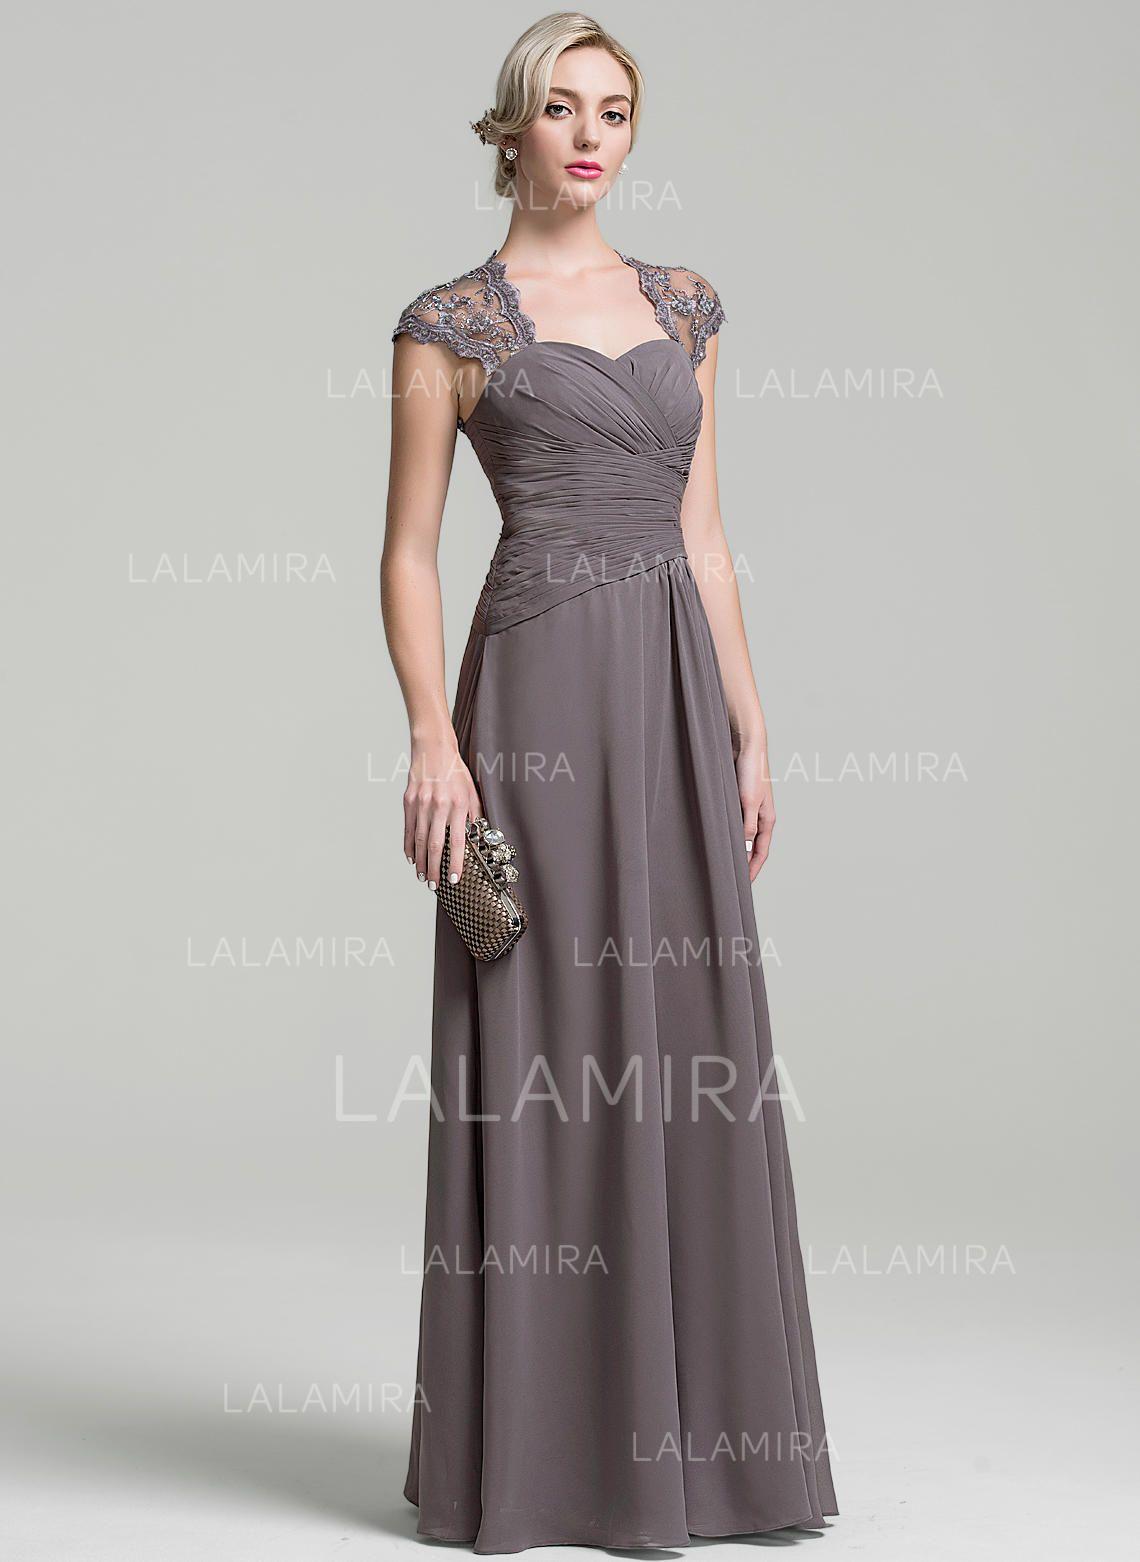 a987499a7e A-Line Princess Chiffon Sleeveless Sweetheart Floor-Length Zipper Up Mother  of the Bride Dresses  215860 - lalamira